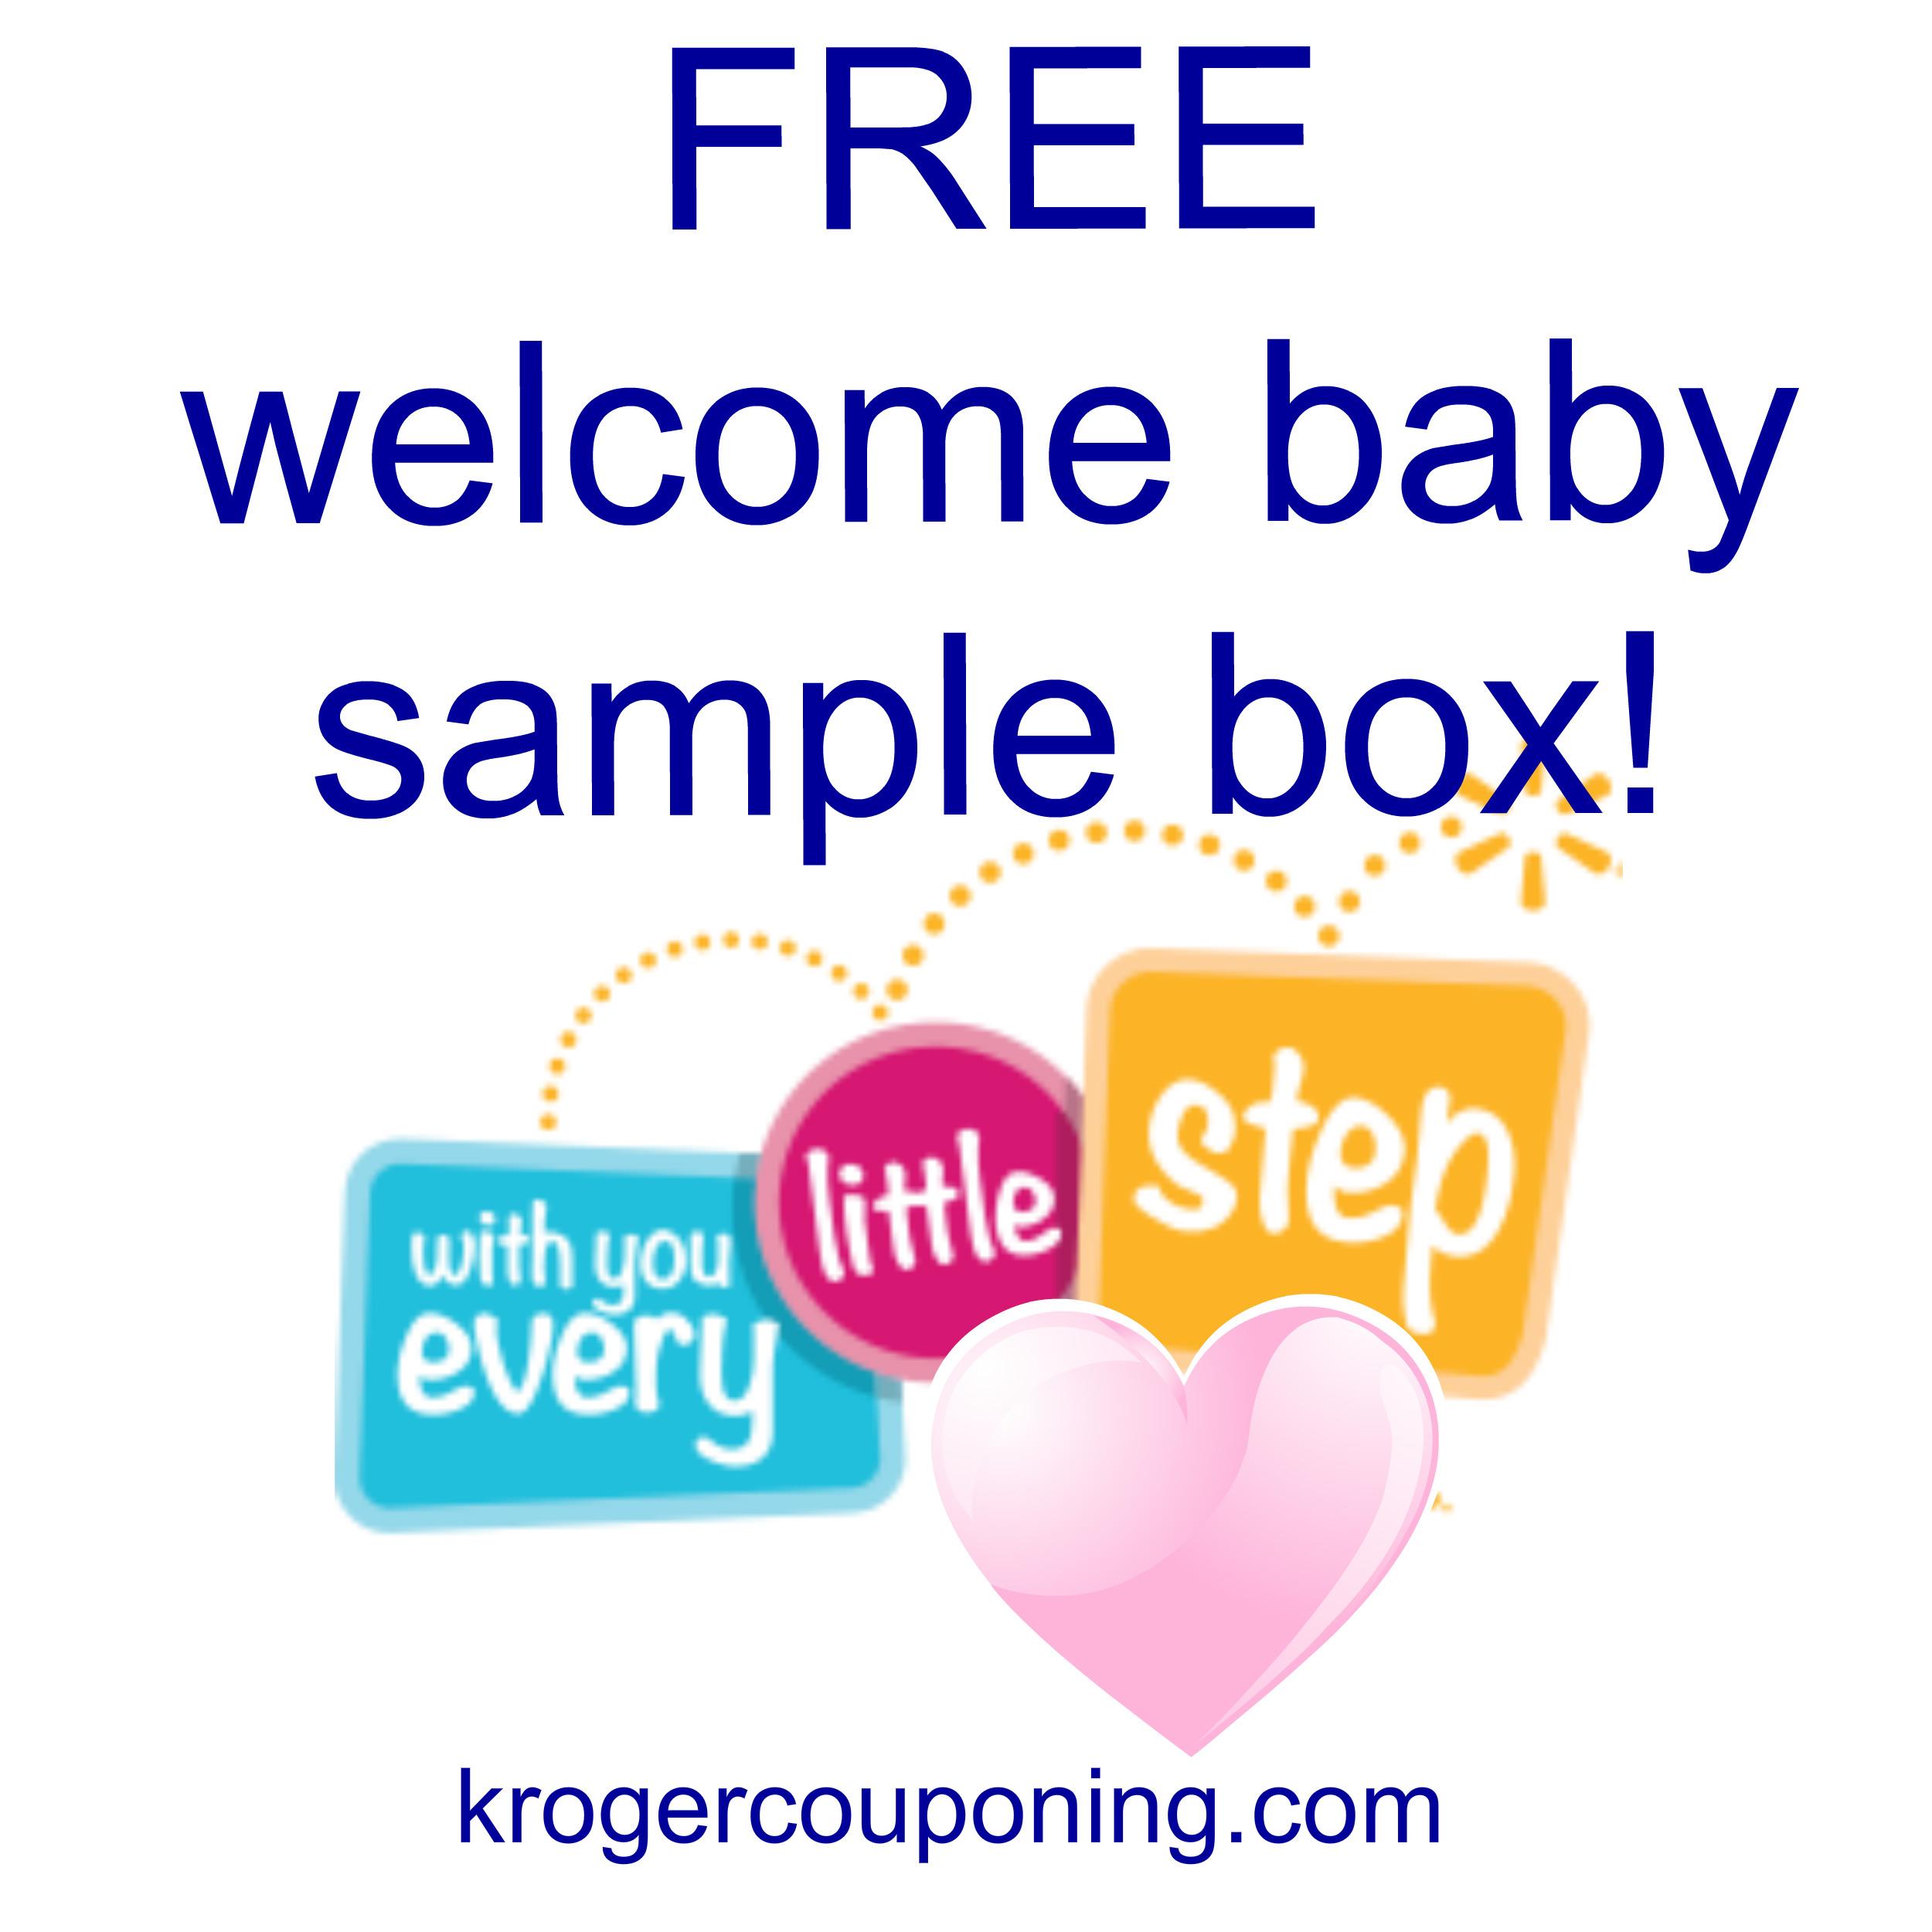 Free kleenex sample box